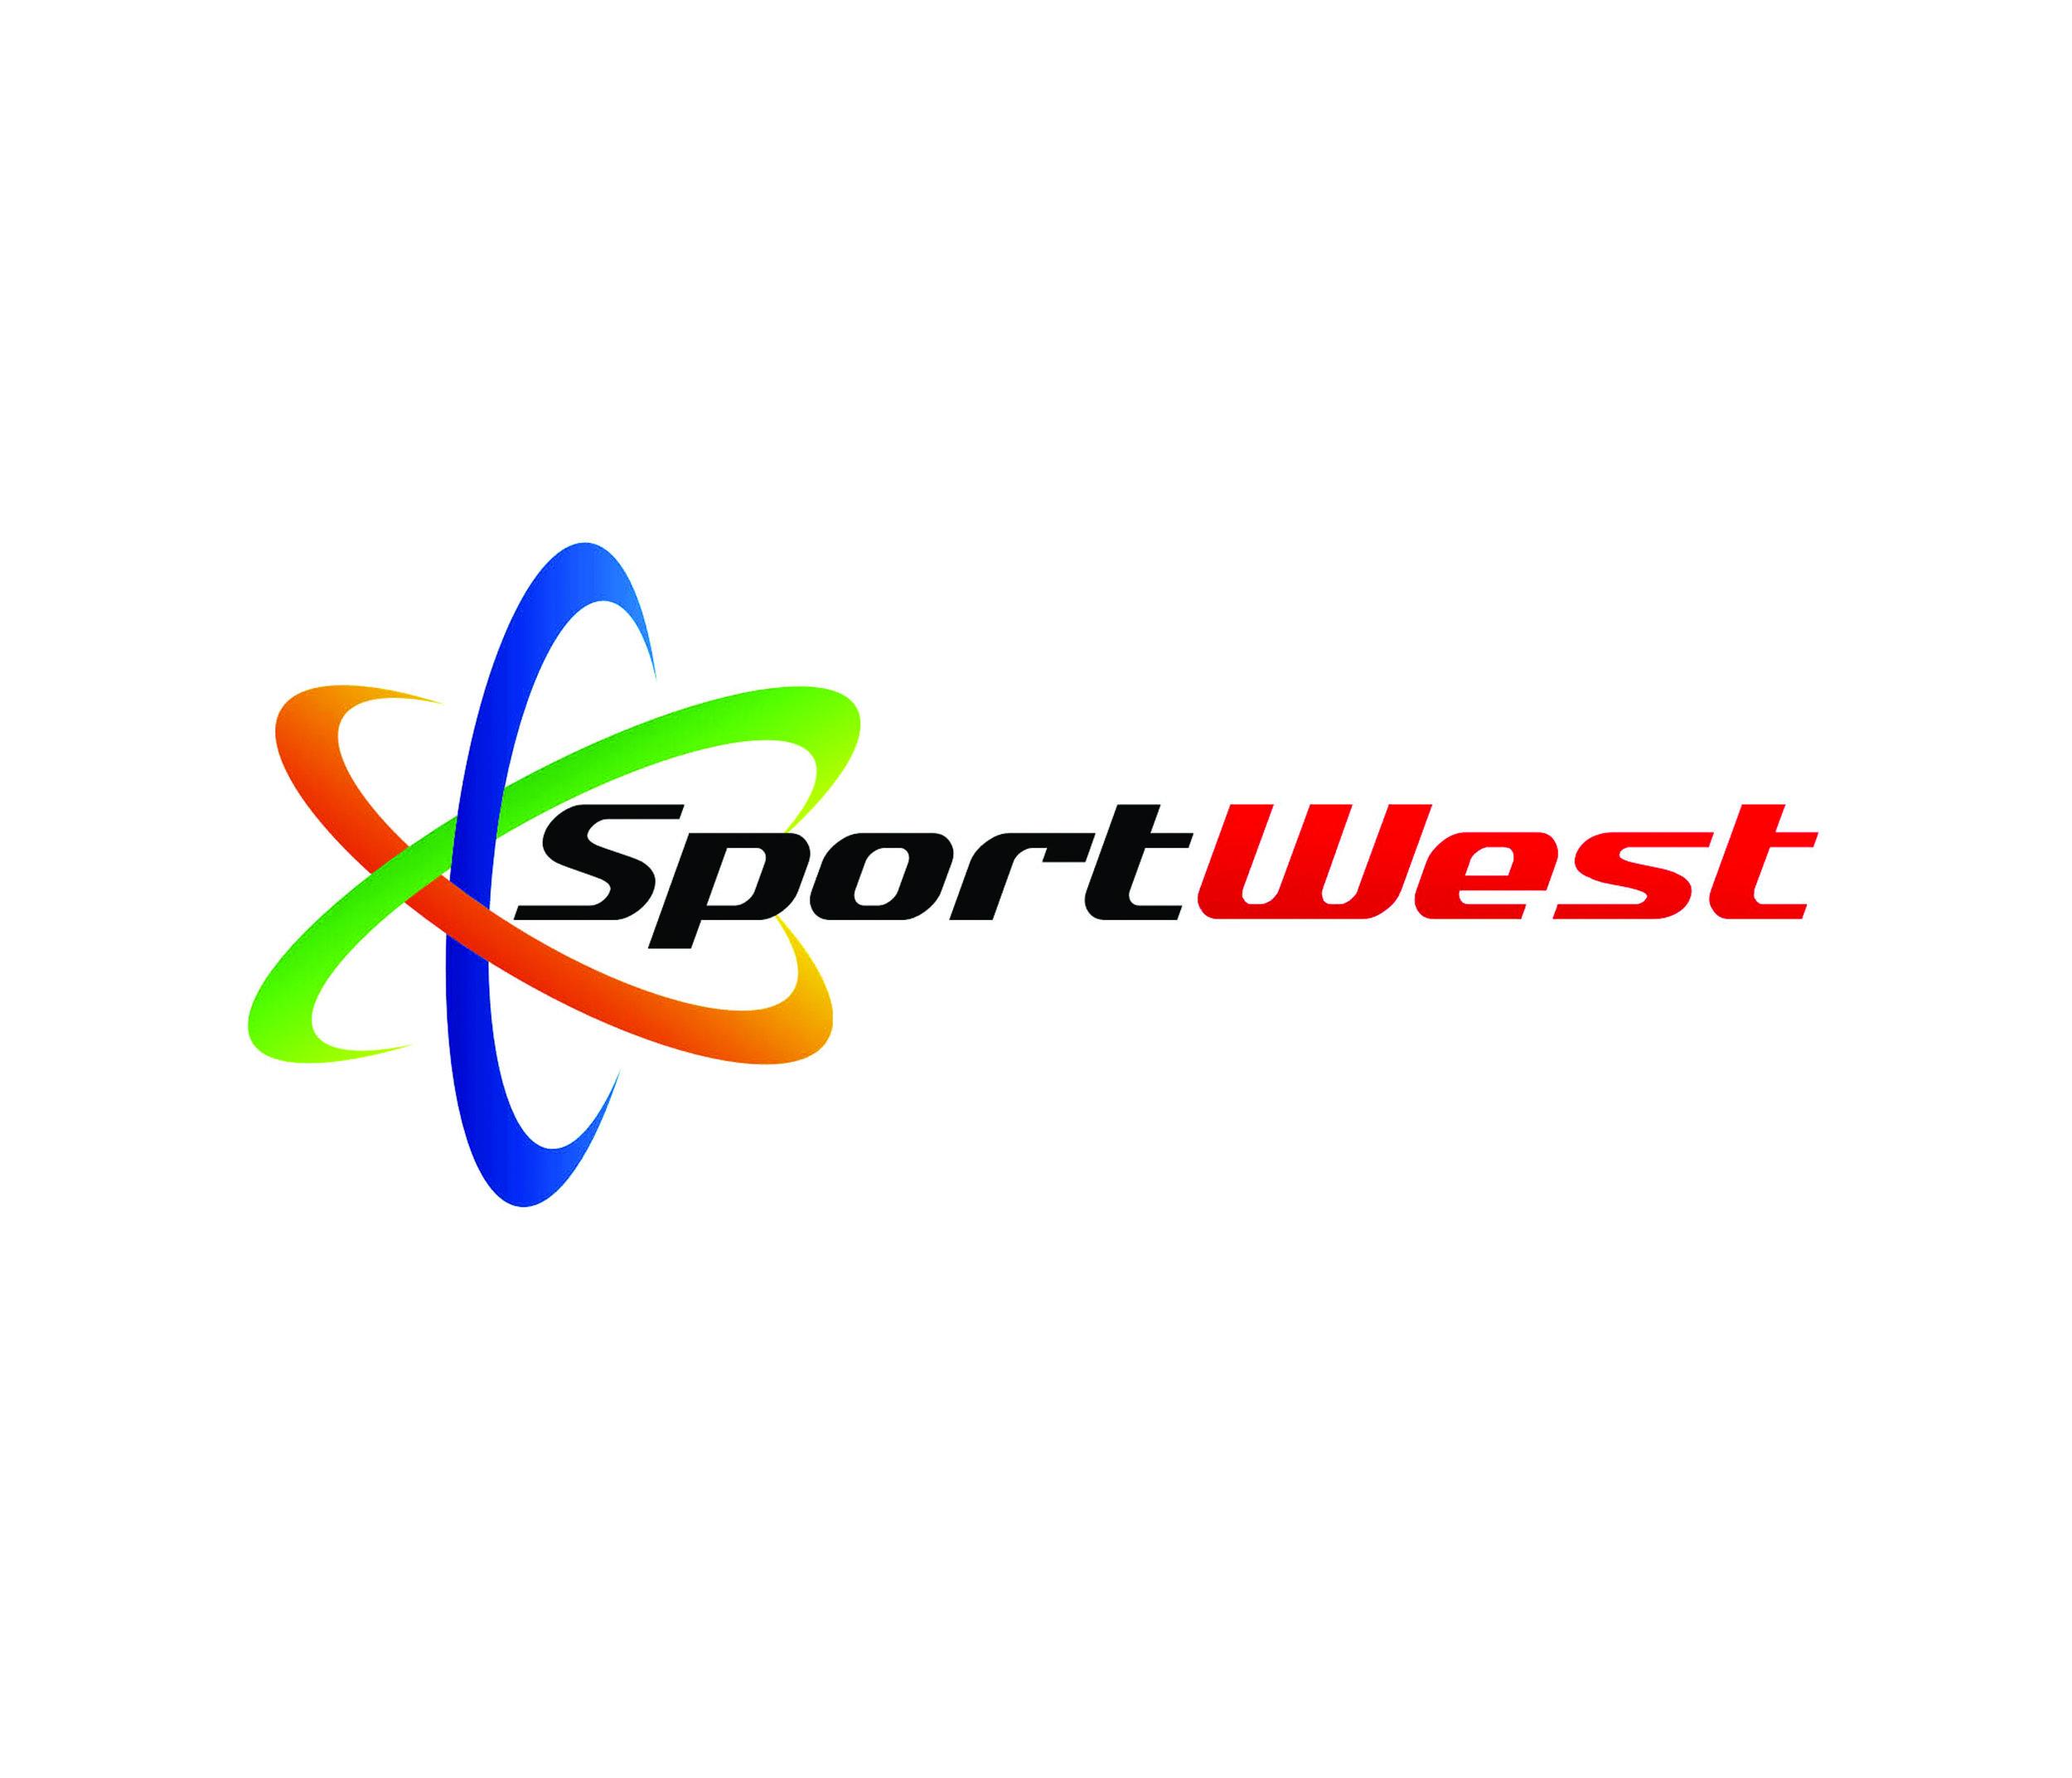 Sportwest.jpg